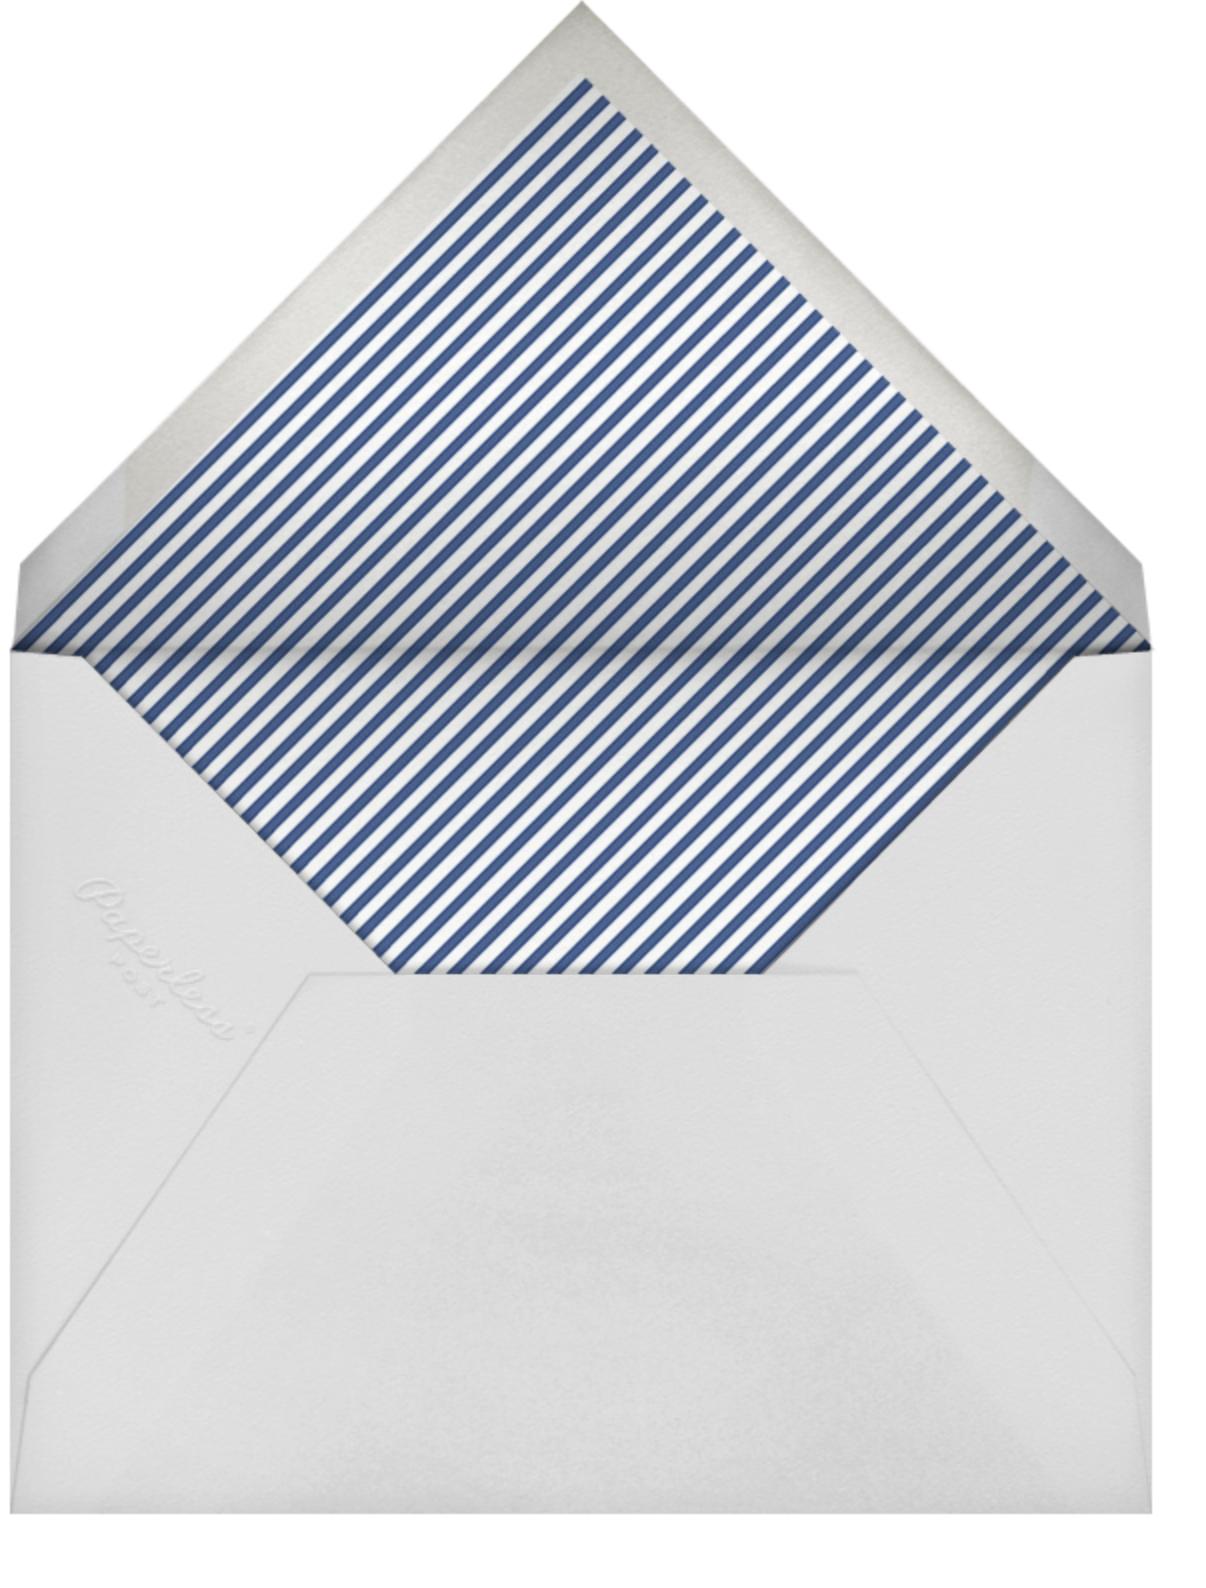 Stripe Border - Peacock - Paperless Post - Adult birthday - envelope back